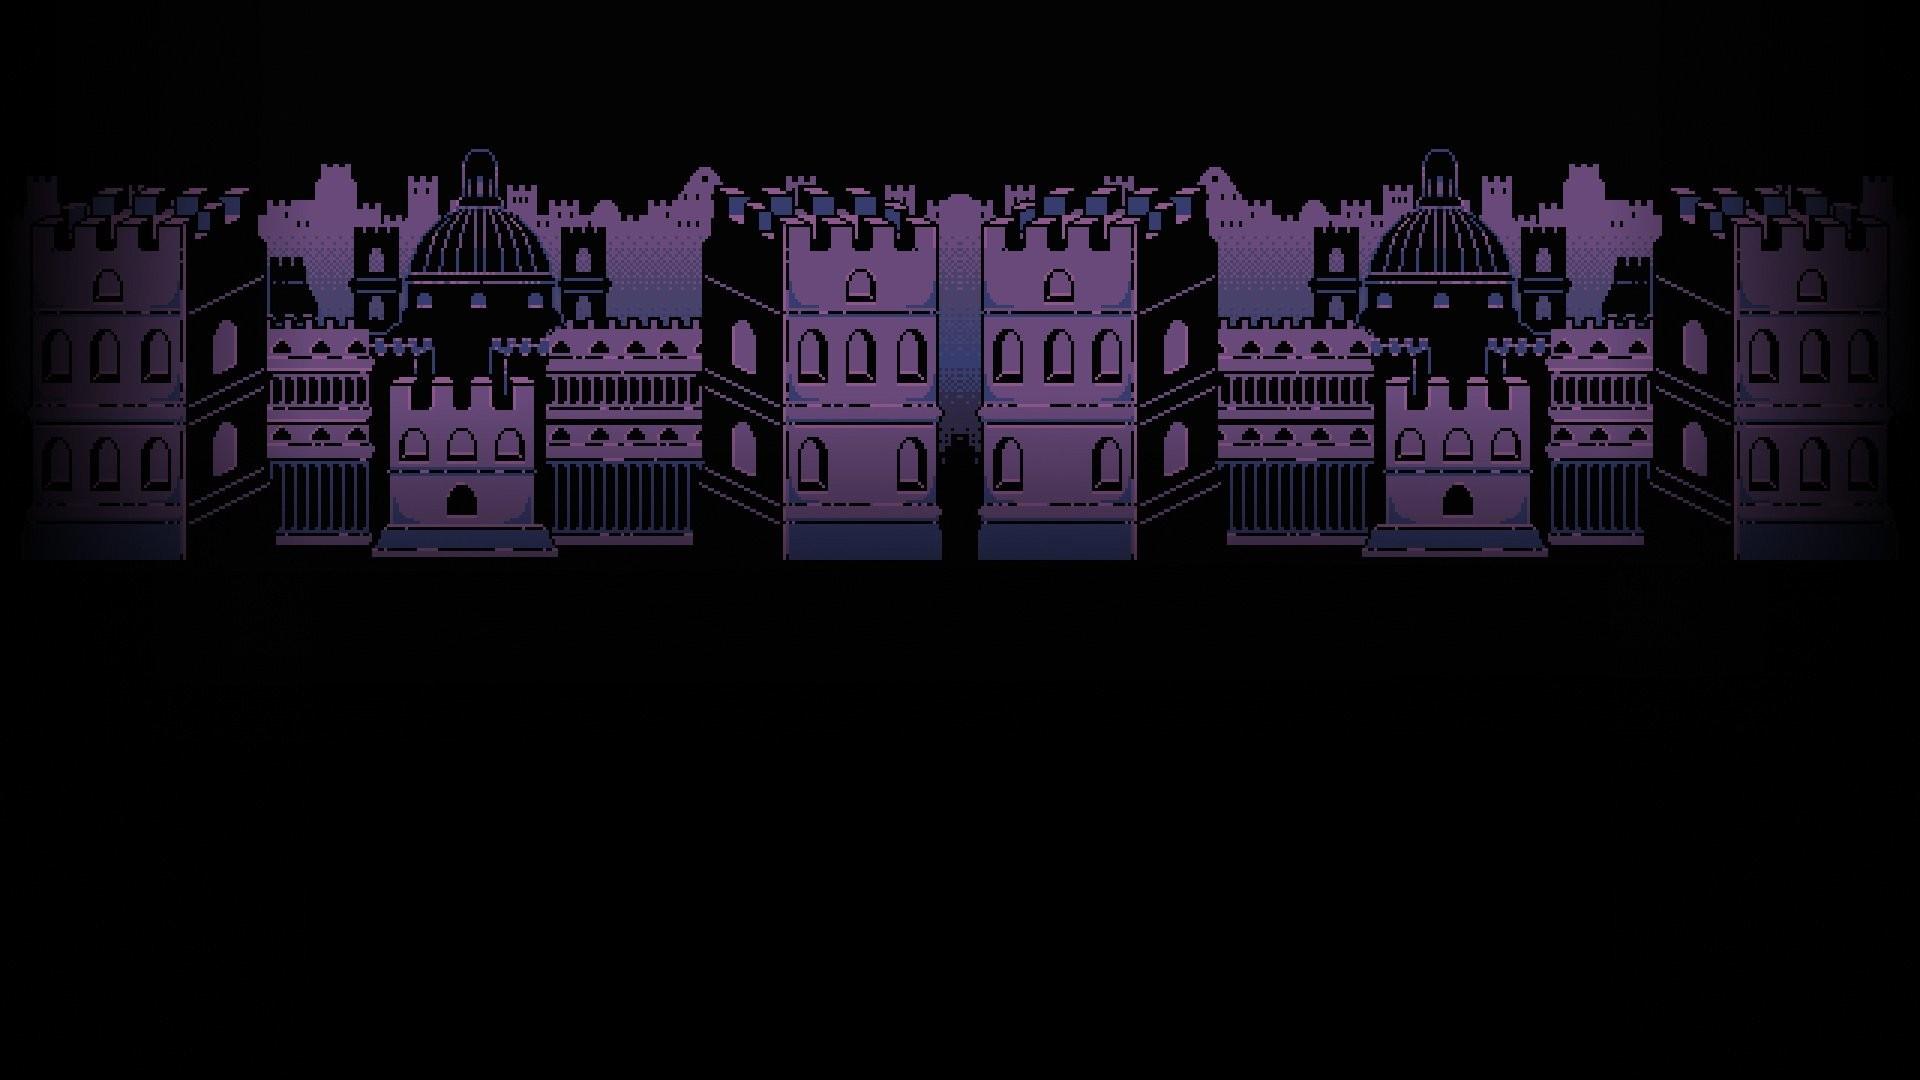 Video Game – Undertale Steam Wallpaper